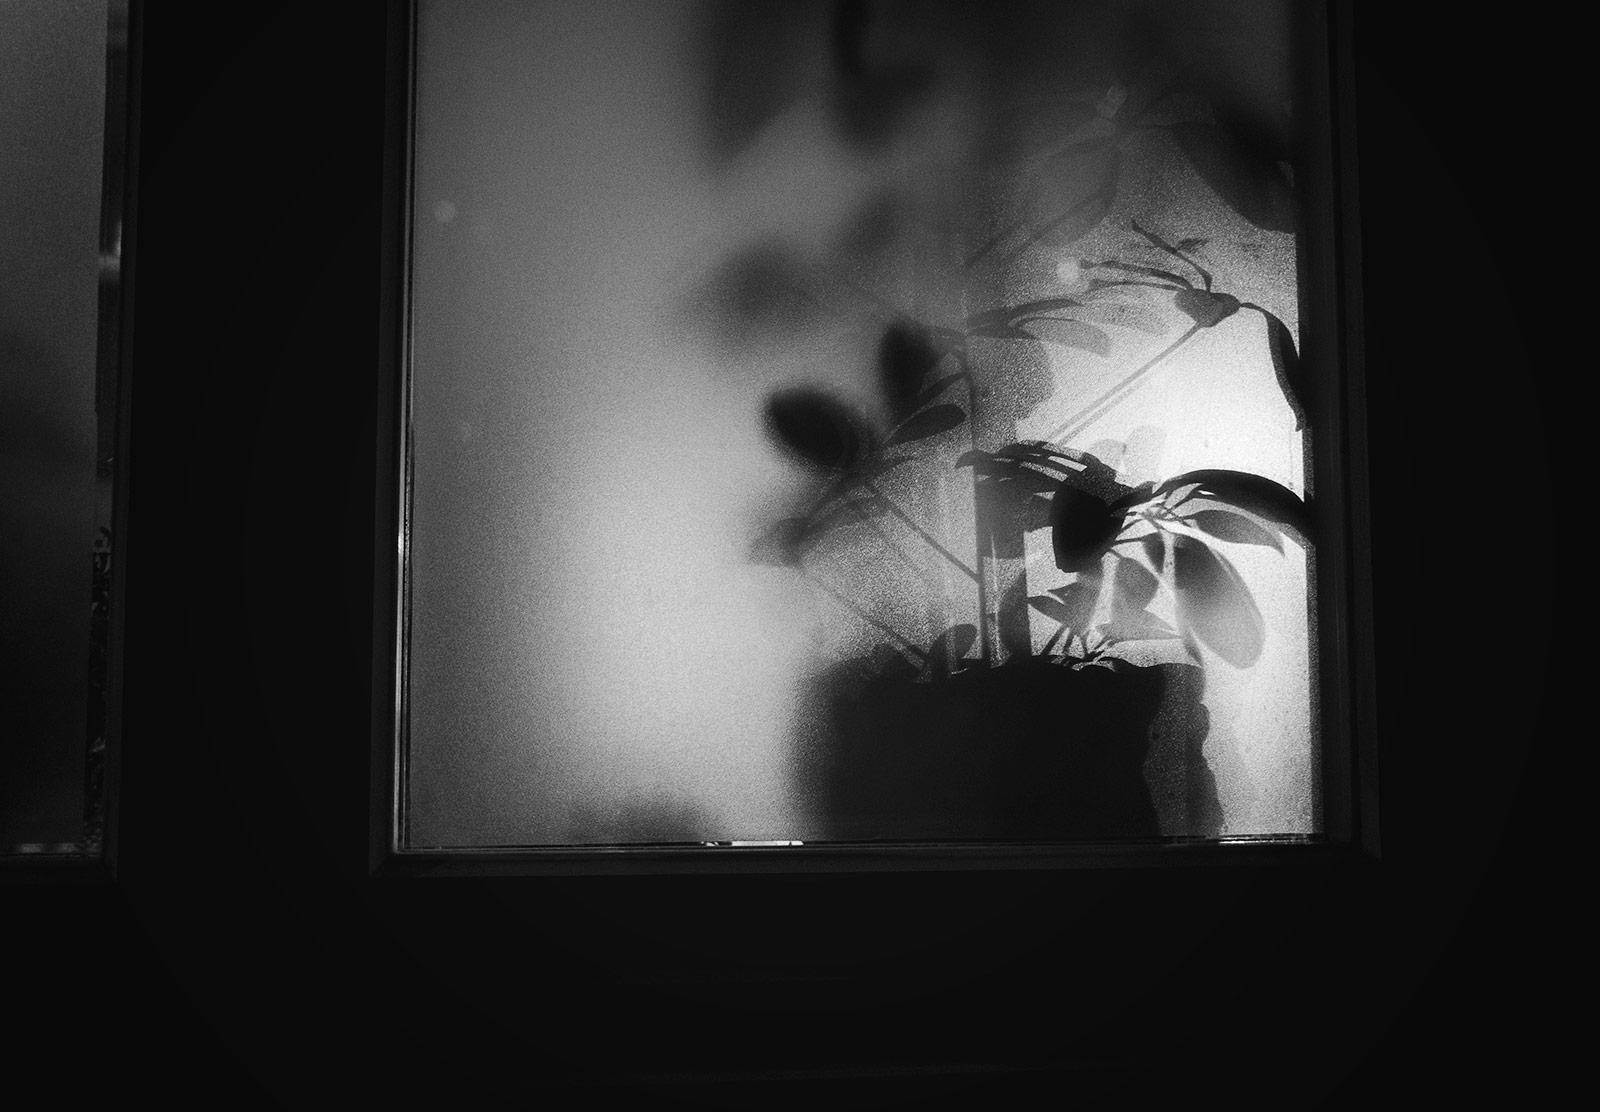 Plant silhouette through window